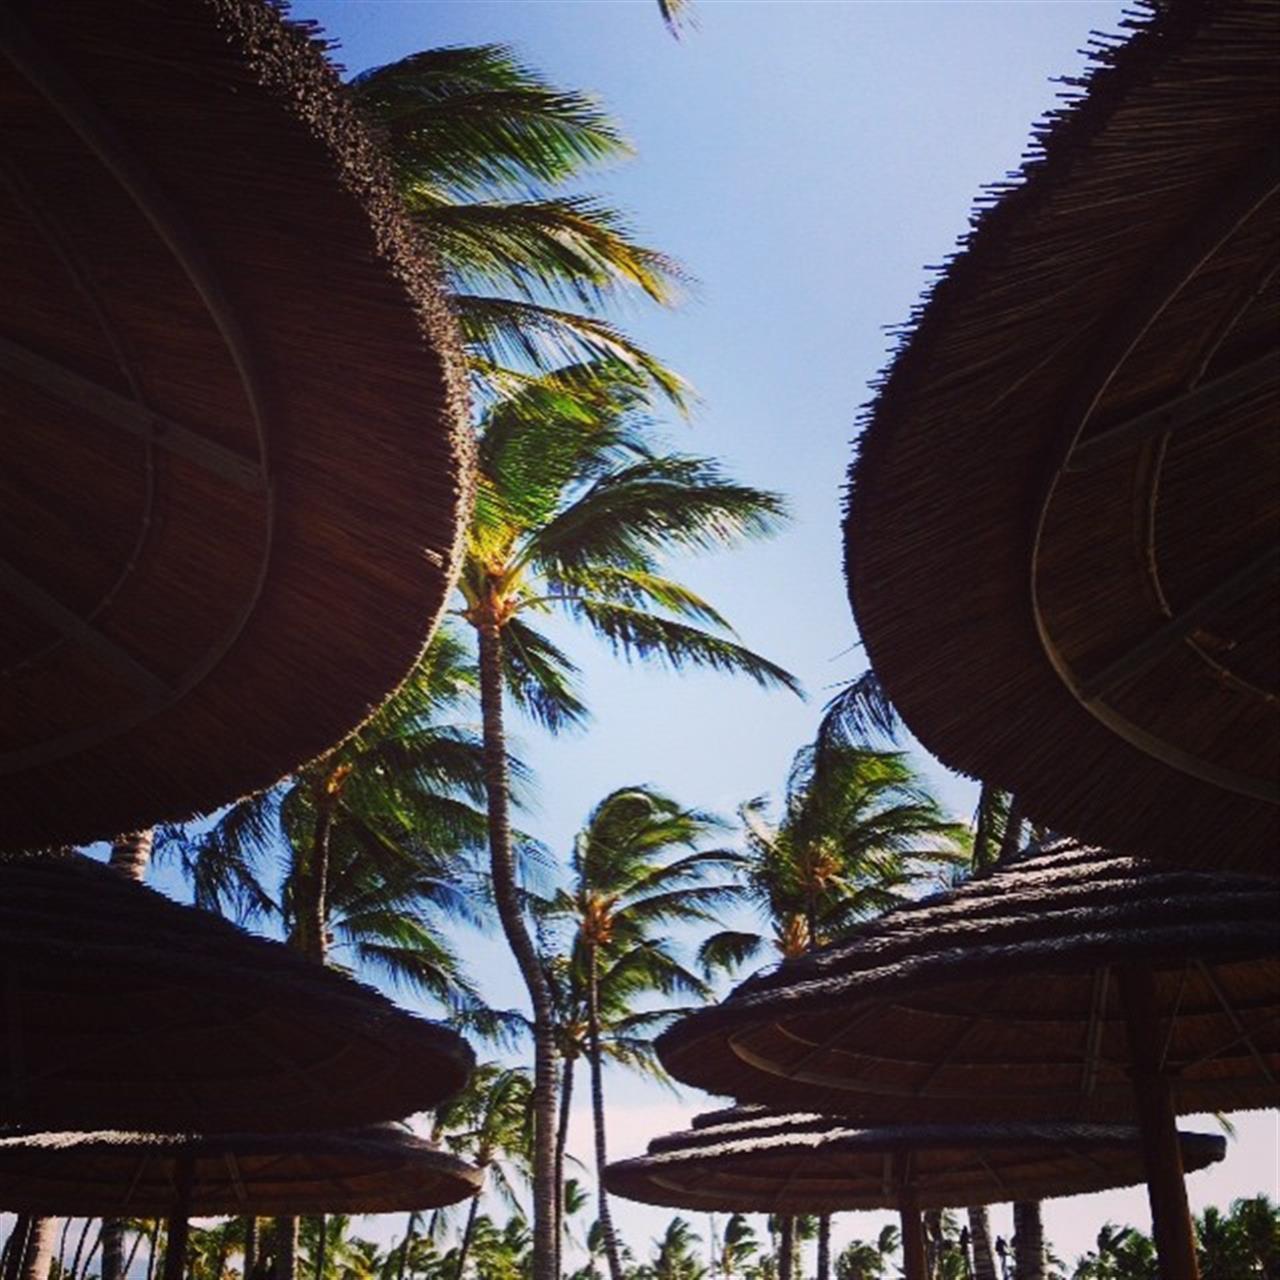 Always sunny on the Kohala Coast of the Big Island!  #Kohala #bigisland #hawaii #leadingrelocal  #??? #???? #??????